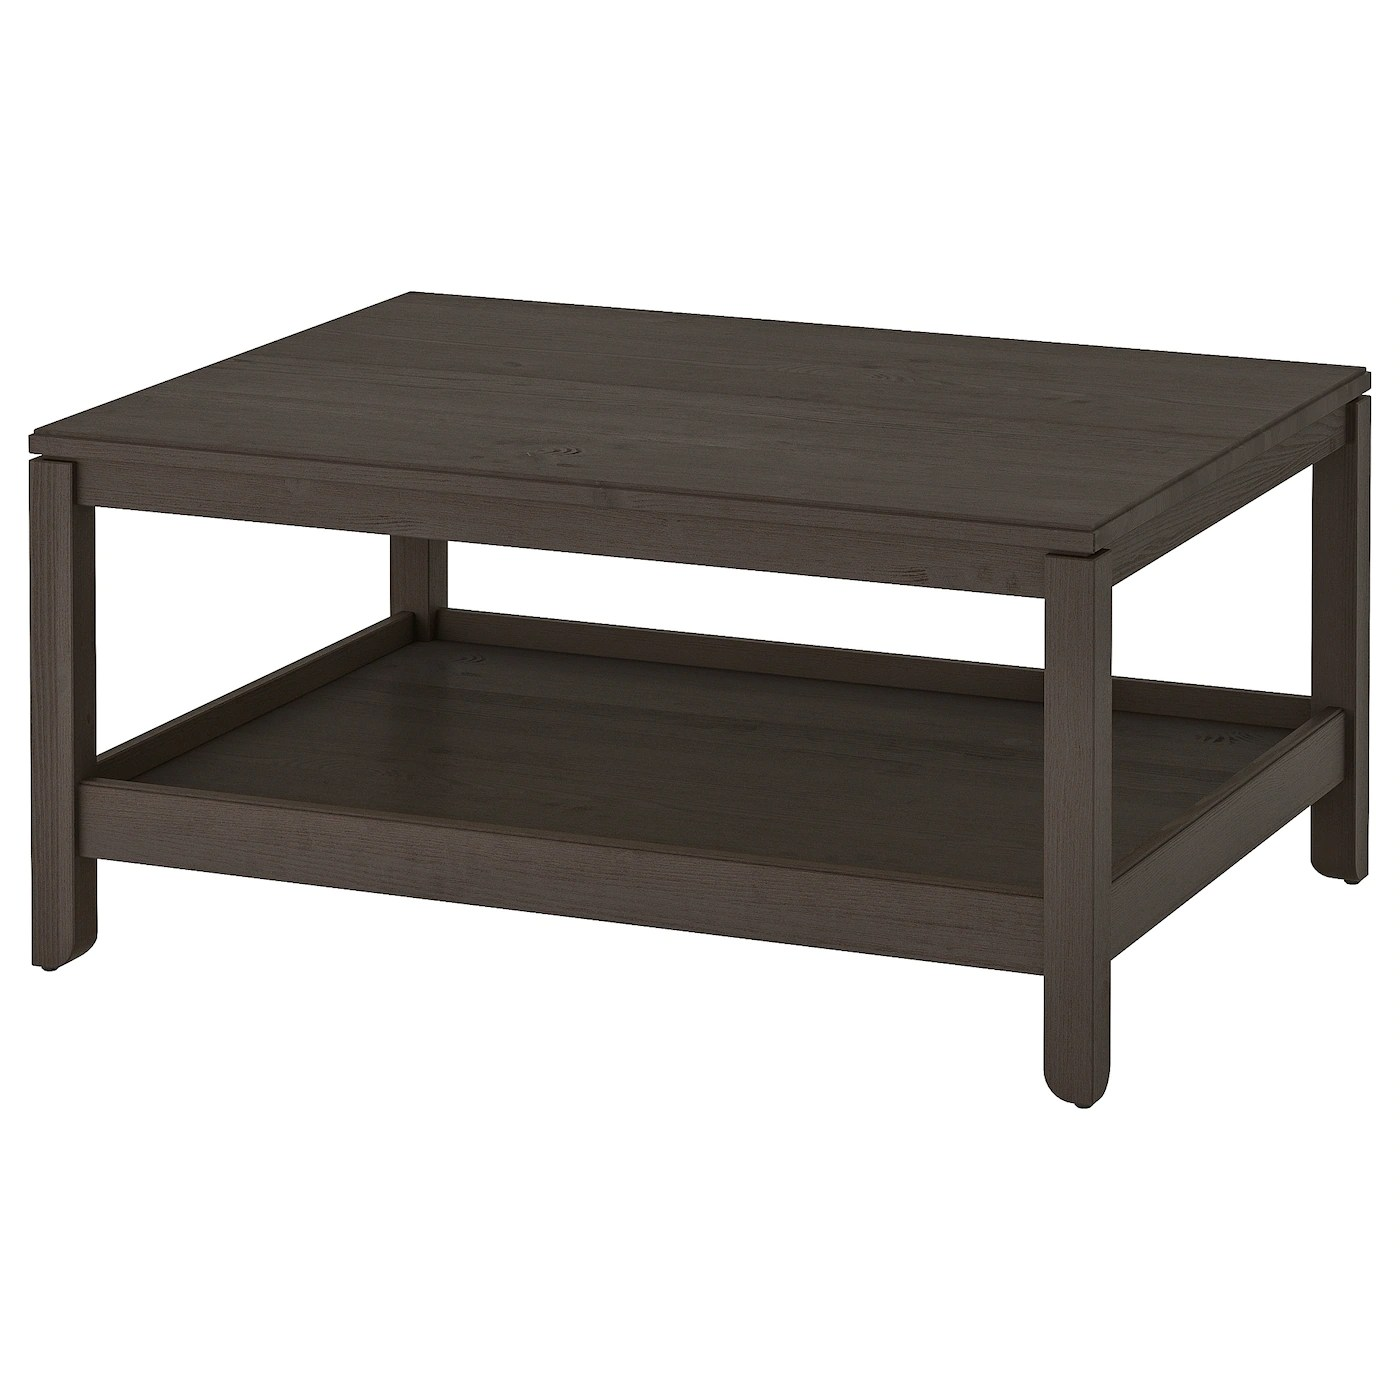 havsta coffee table dark brown 100x75 cm